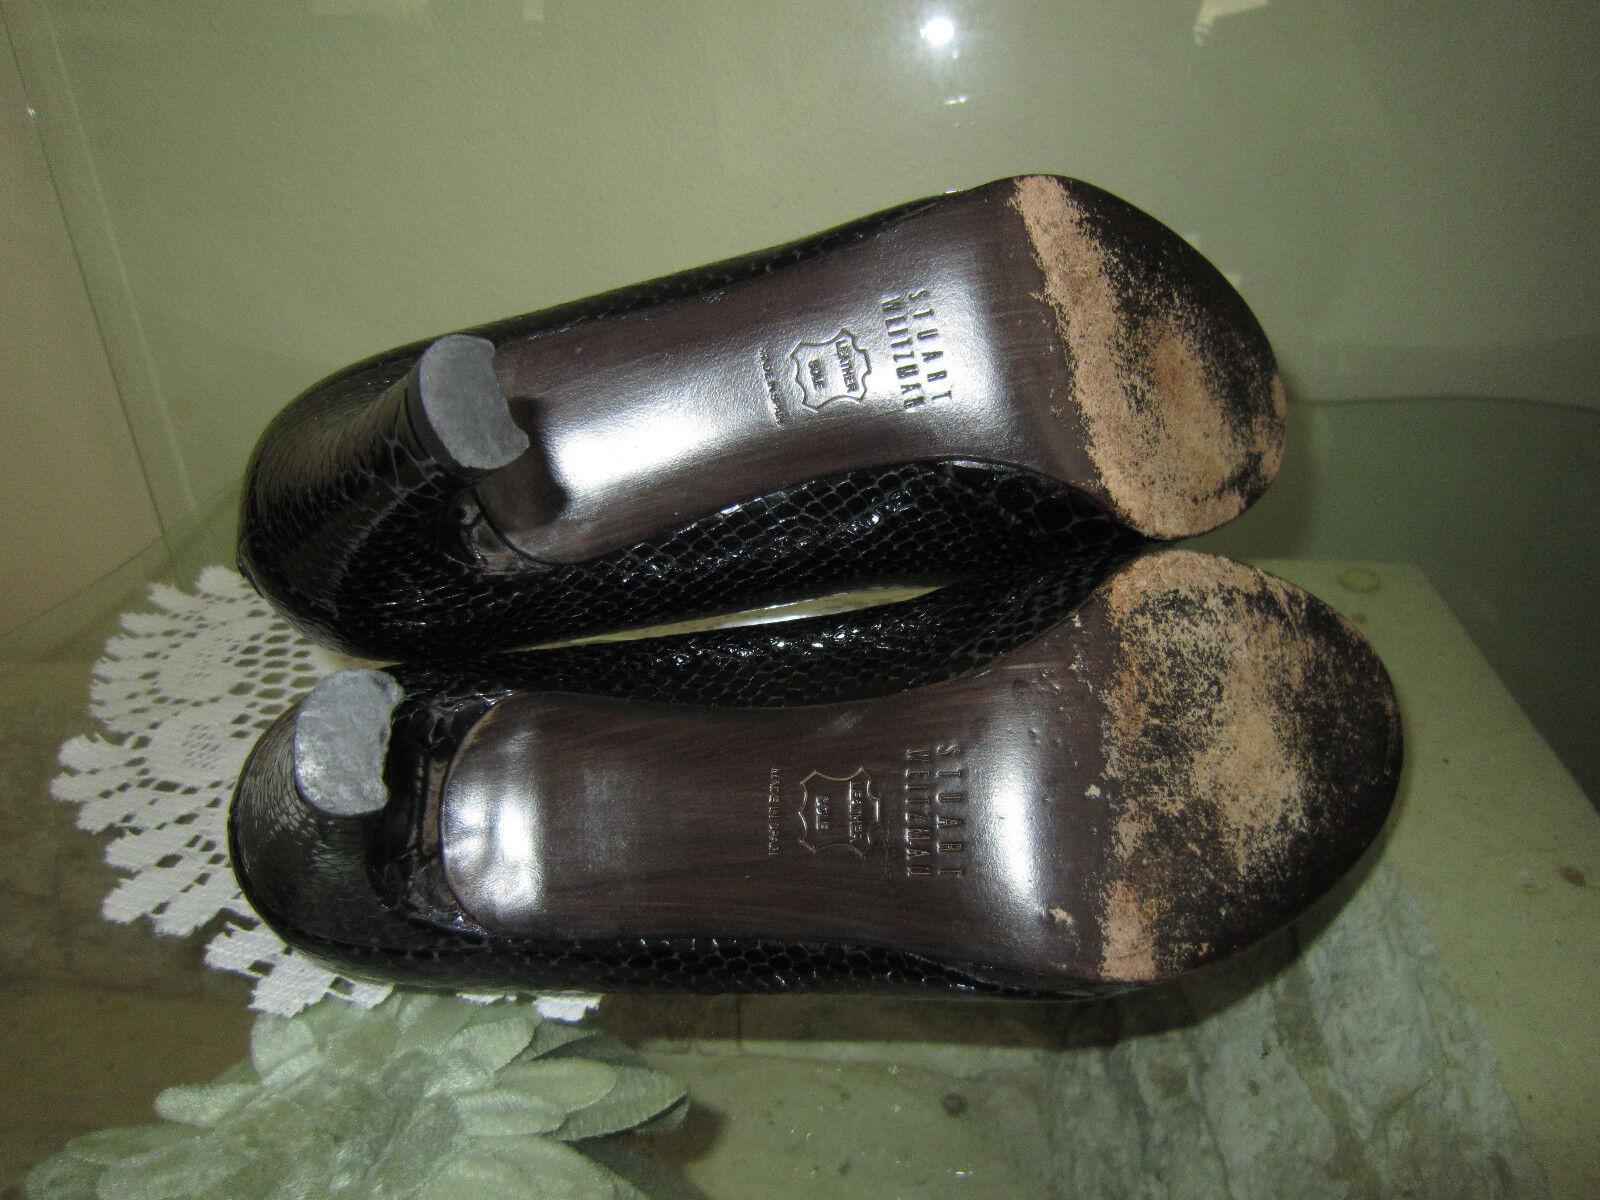 Stuart Weitzman Black Black Black Patent Leather Peep Toe Croc Classic Pump Sz 6 1 2 M e9b7d8